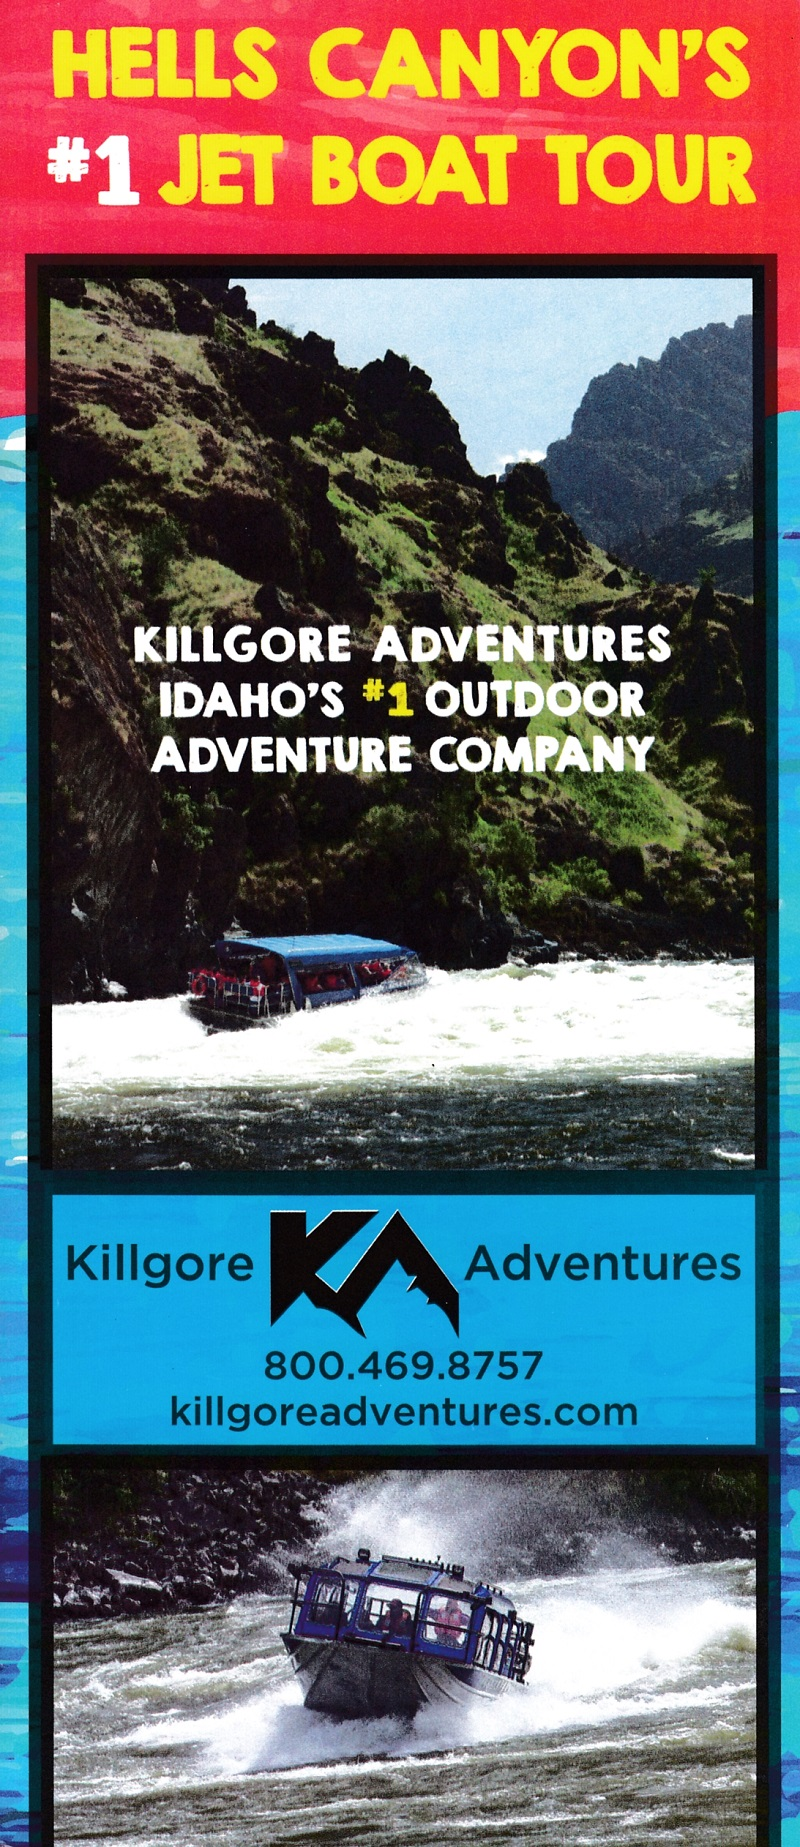 Killgore Adventures